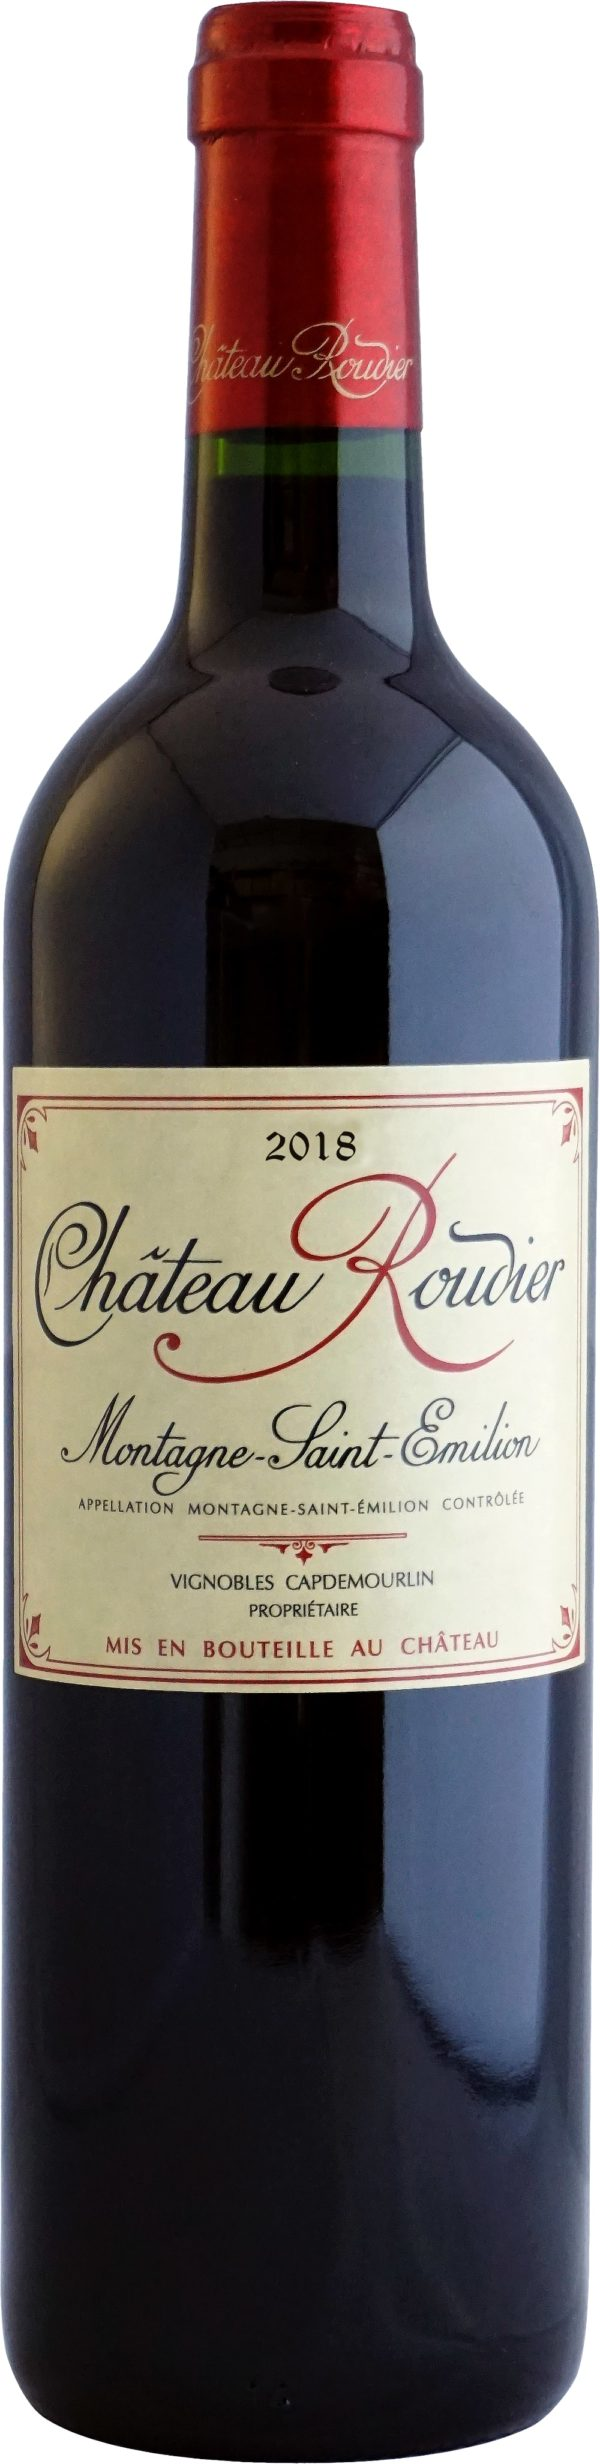 Château Roudier 2018